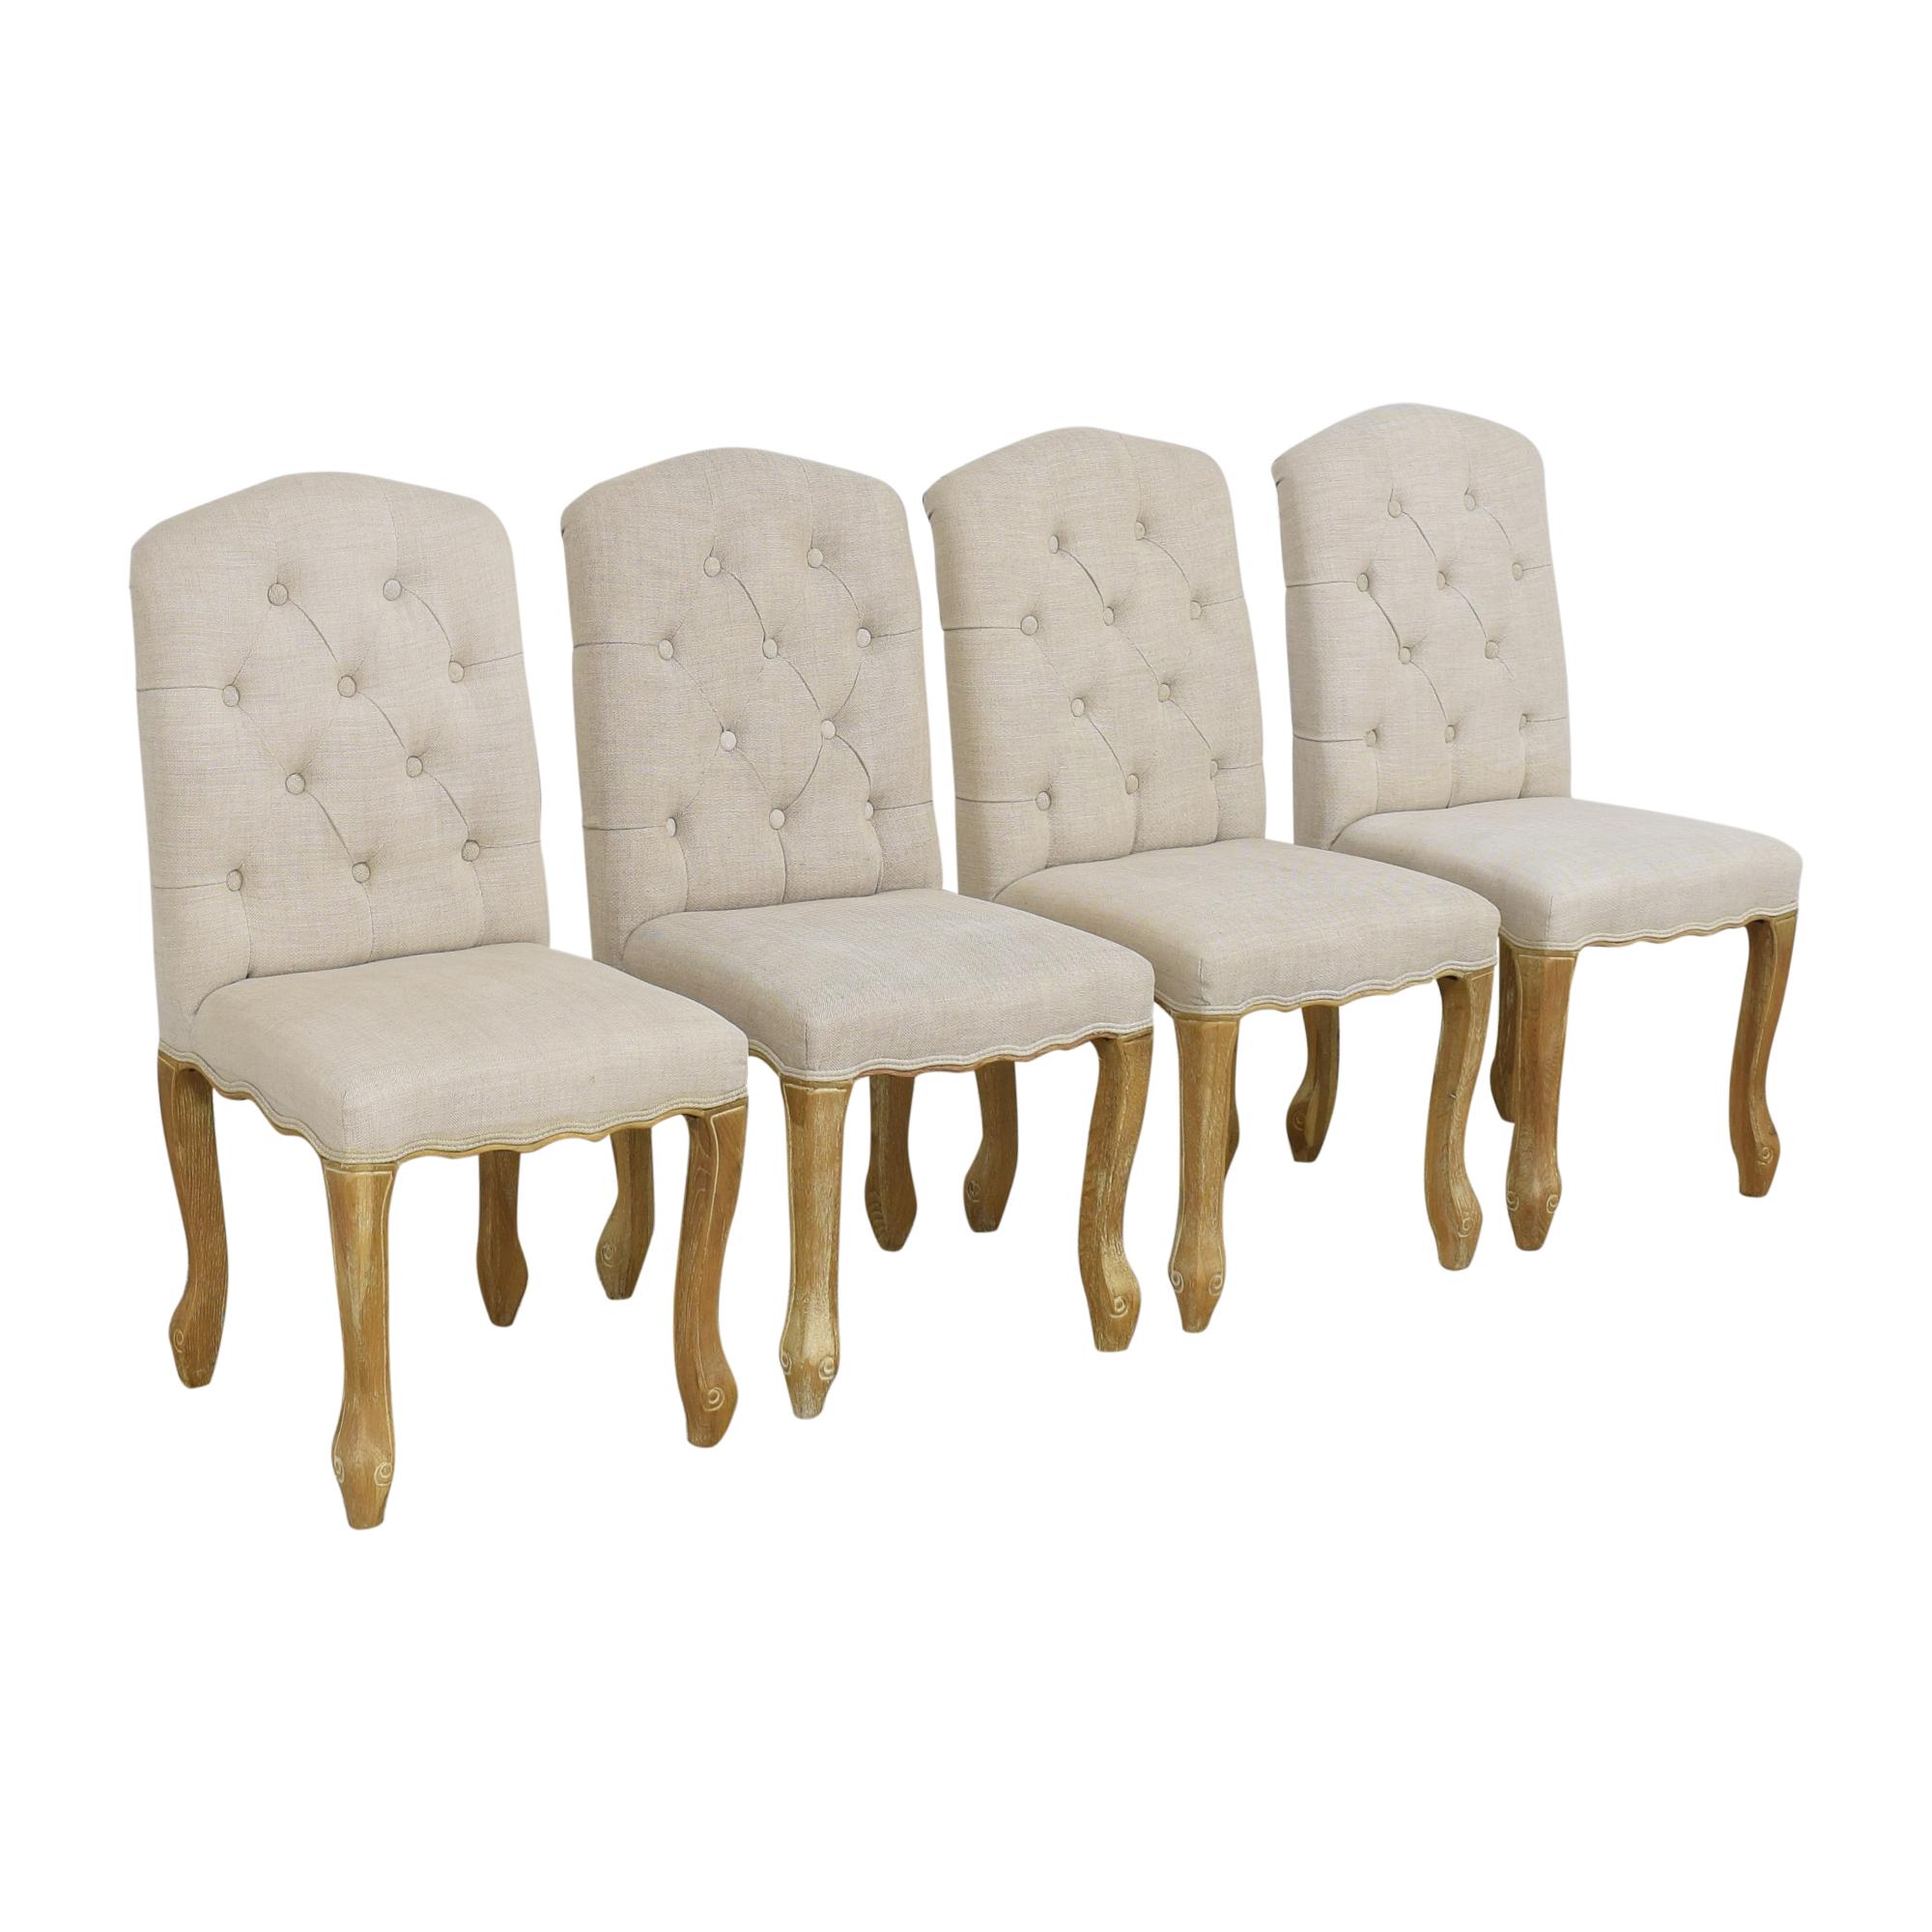 Zuo Modern Noe Valley Chairs Zuo Modern